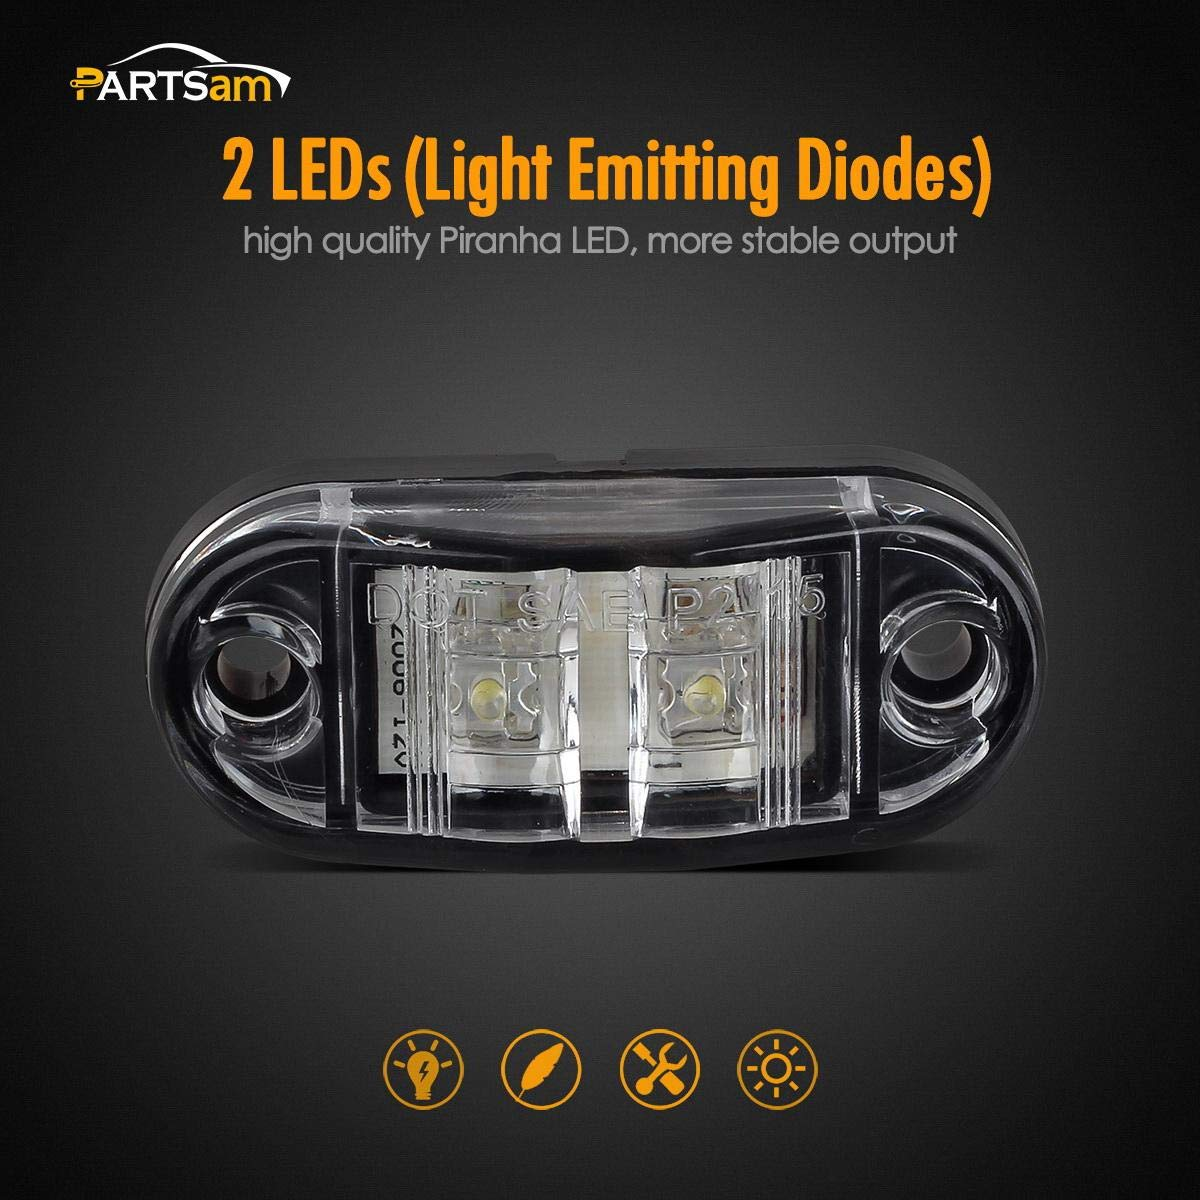 Partsam 2X Trailer Truck Surface Mount LED Oval 2.5 Red Side Marker Lamp Bulb 2 Diode